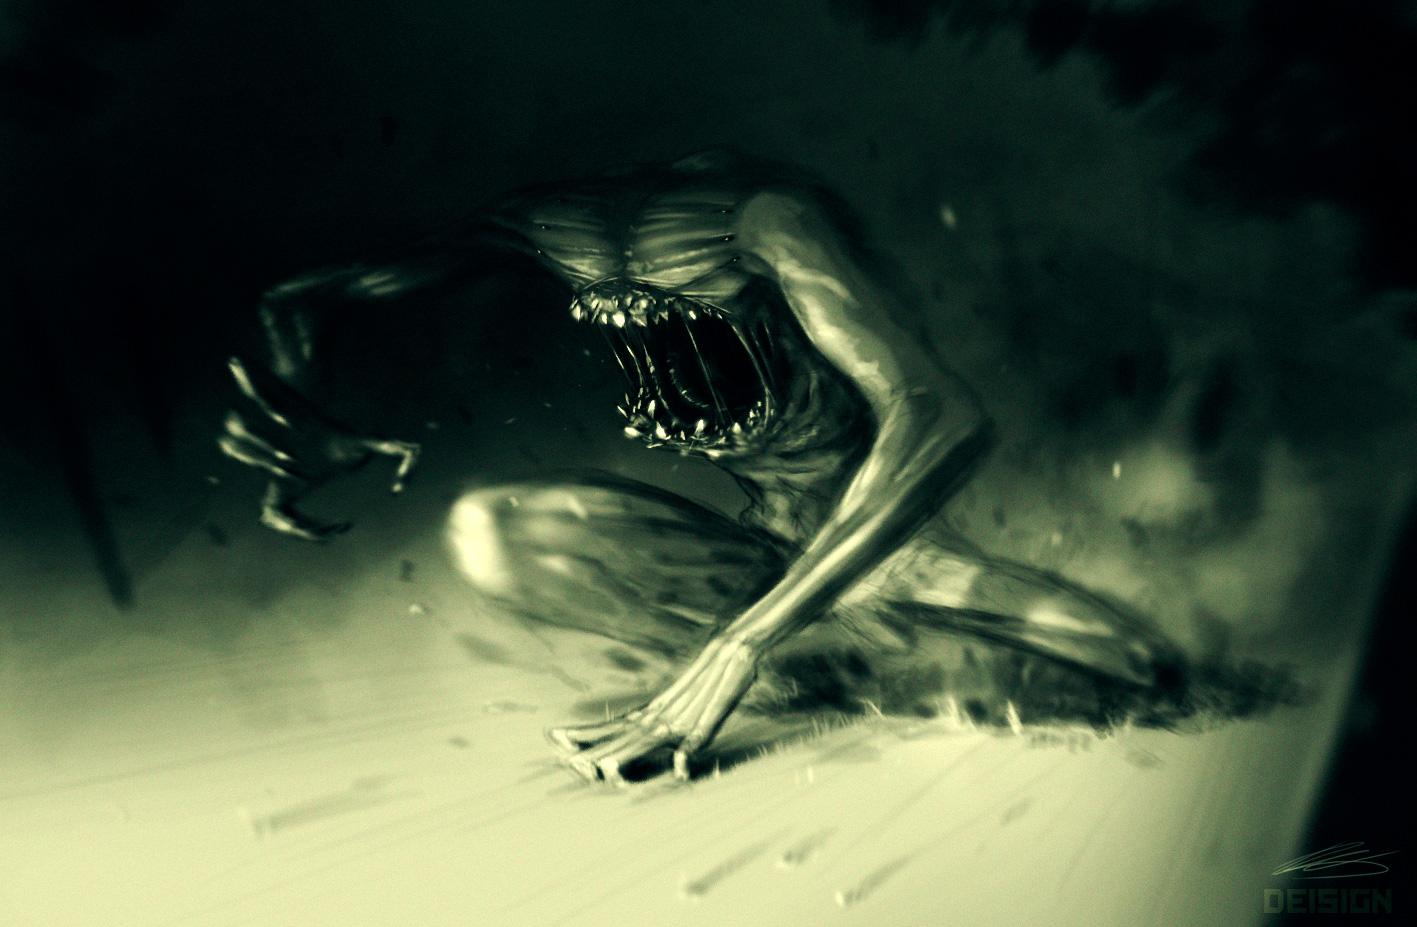 http://2.bp.blogspot.com/--_Hne--A_tA/UKkh4O8nG3I/AAAAAAAACLQ/91wV3_Qf4i4/s1600/DEISIGN_Anthropophagi_The_Monstrumologist.jpg